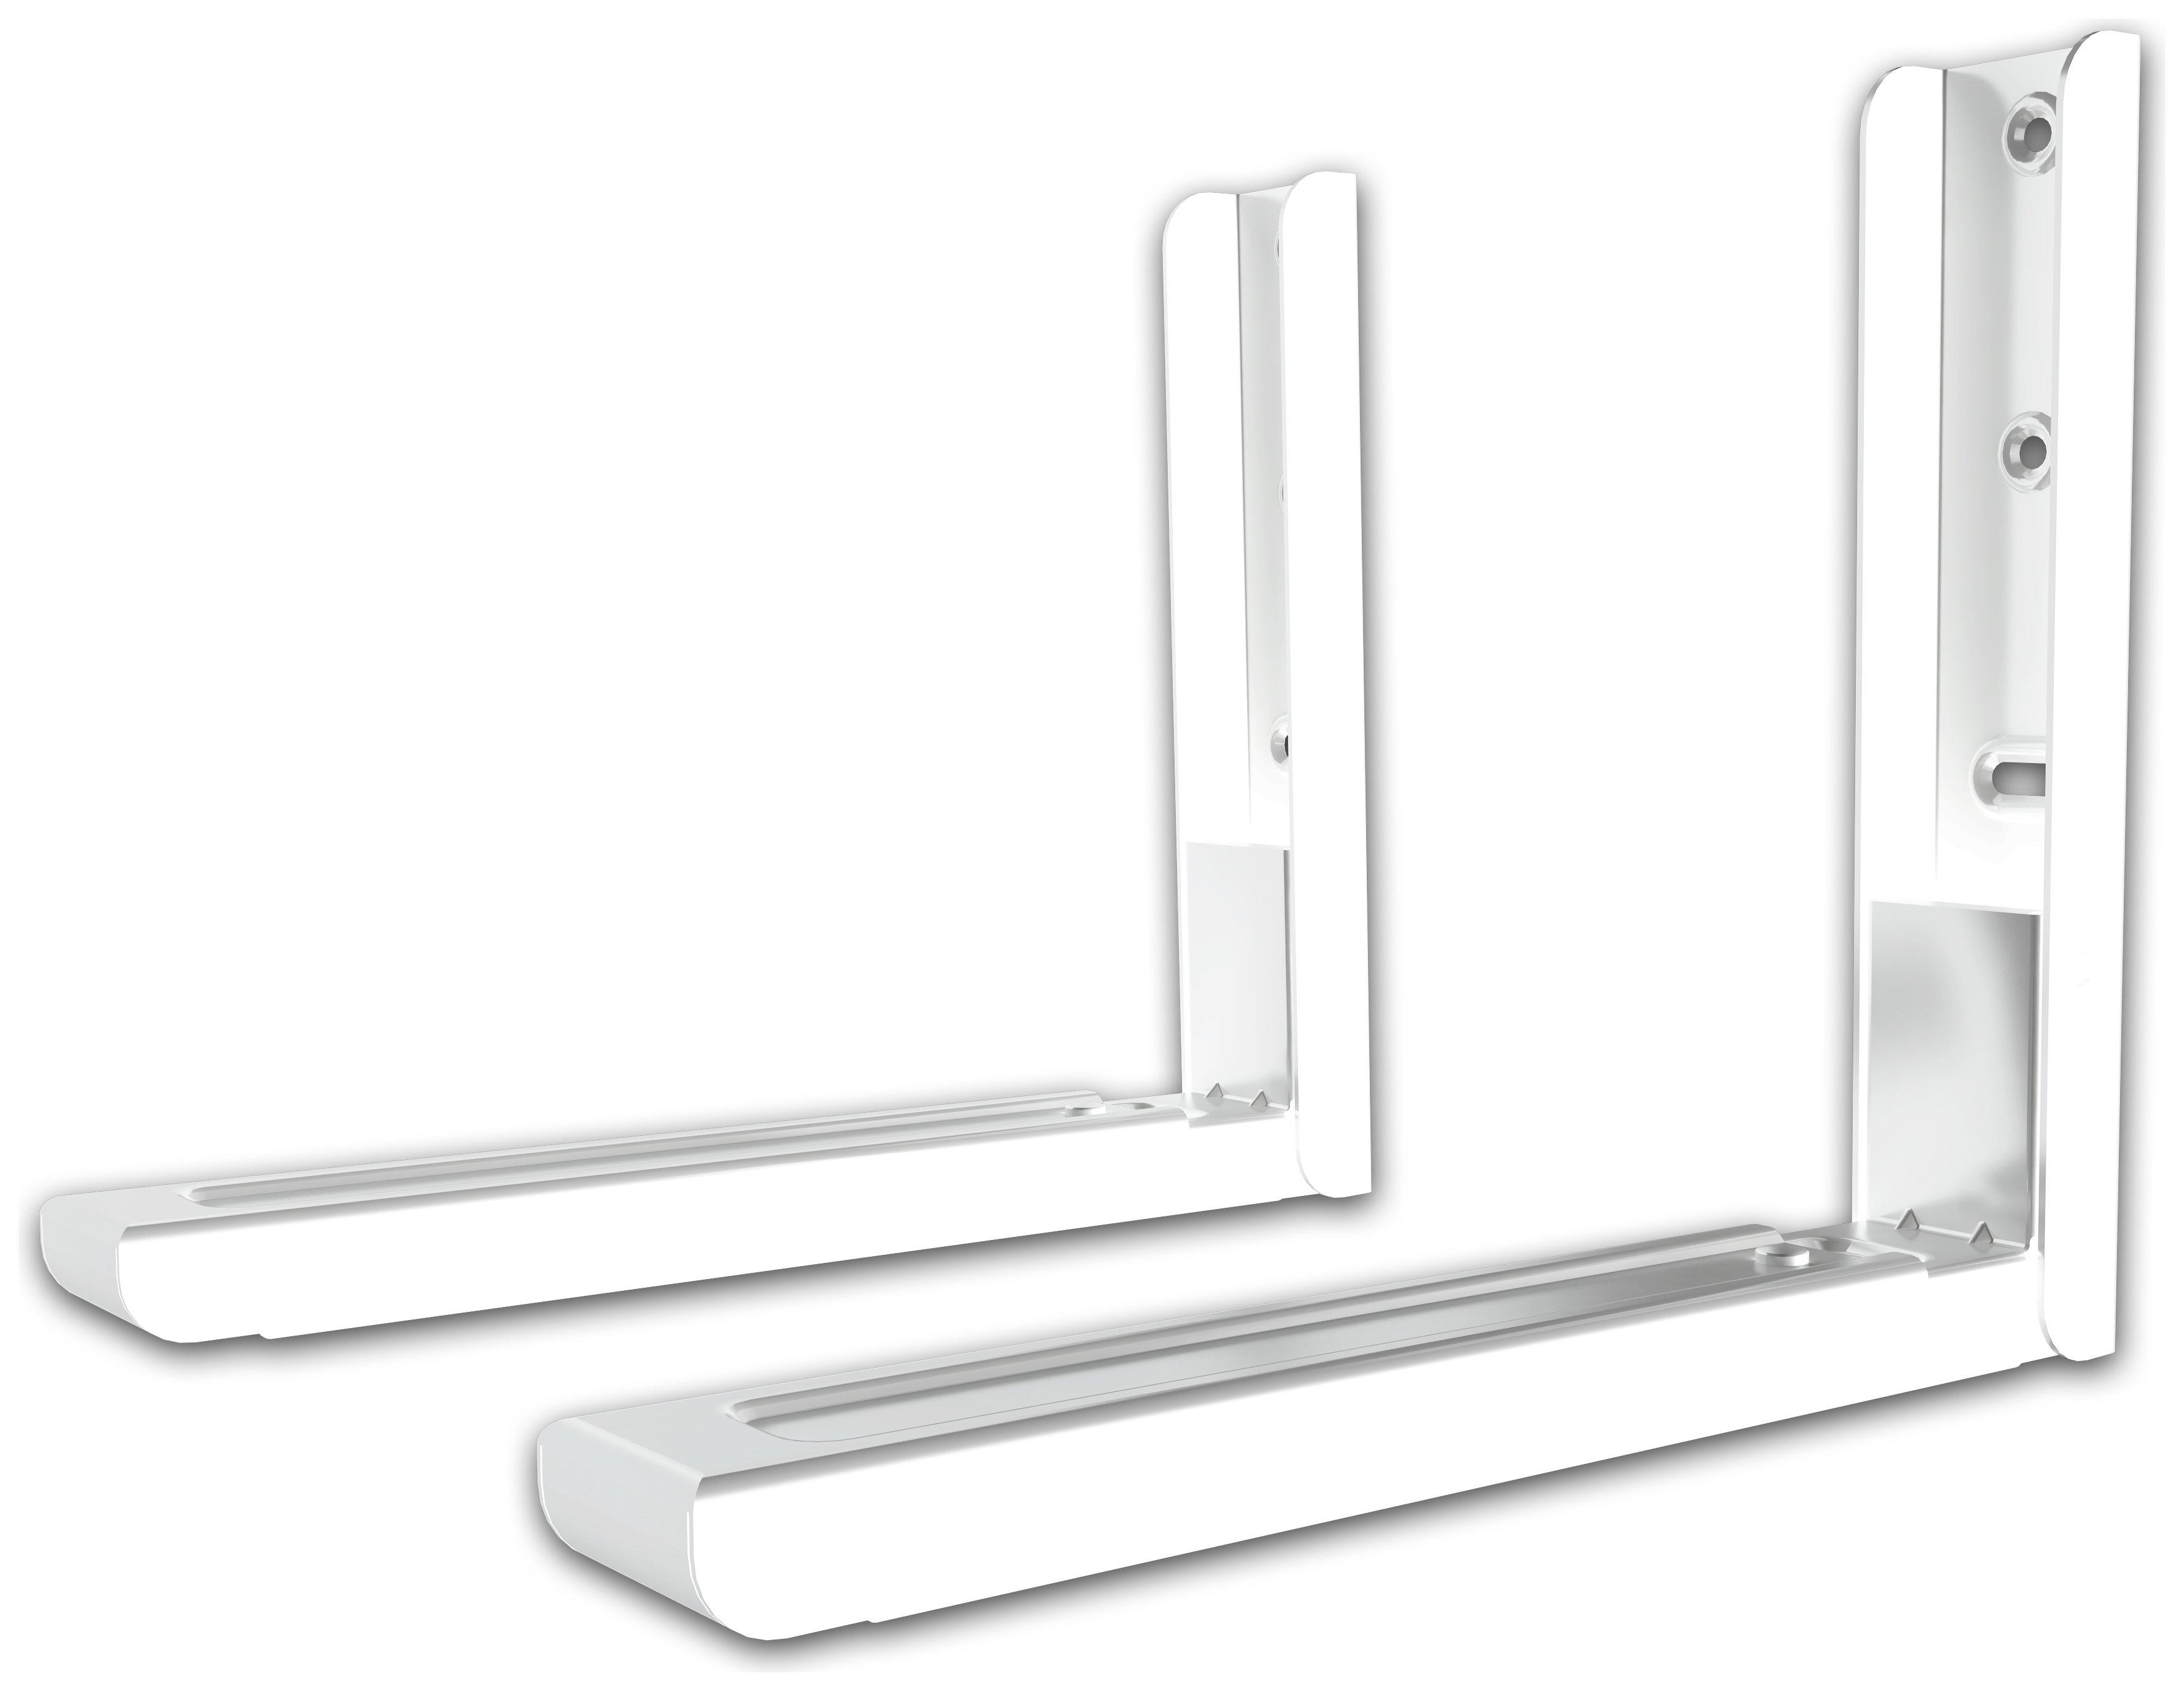 Universal Microwave Wall Bracket - White